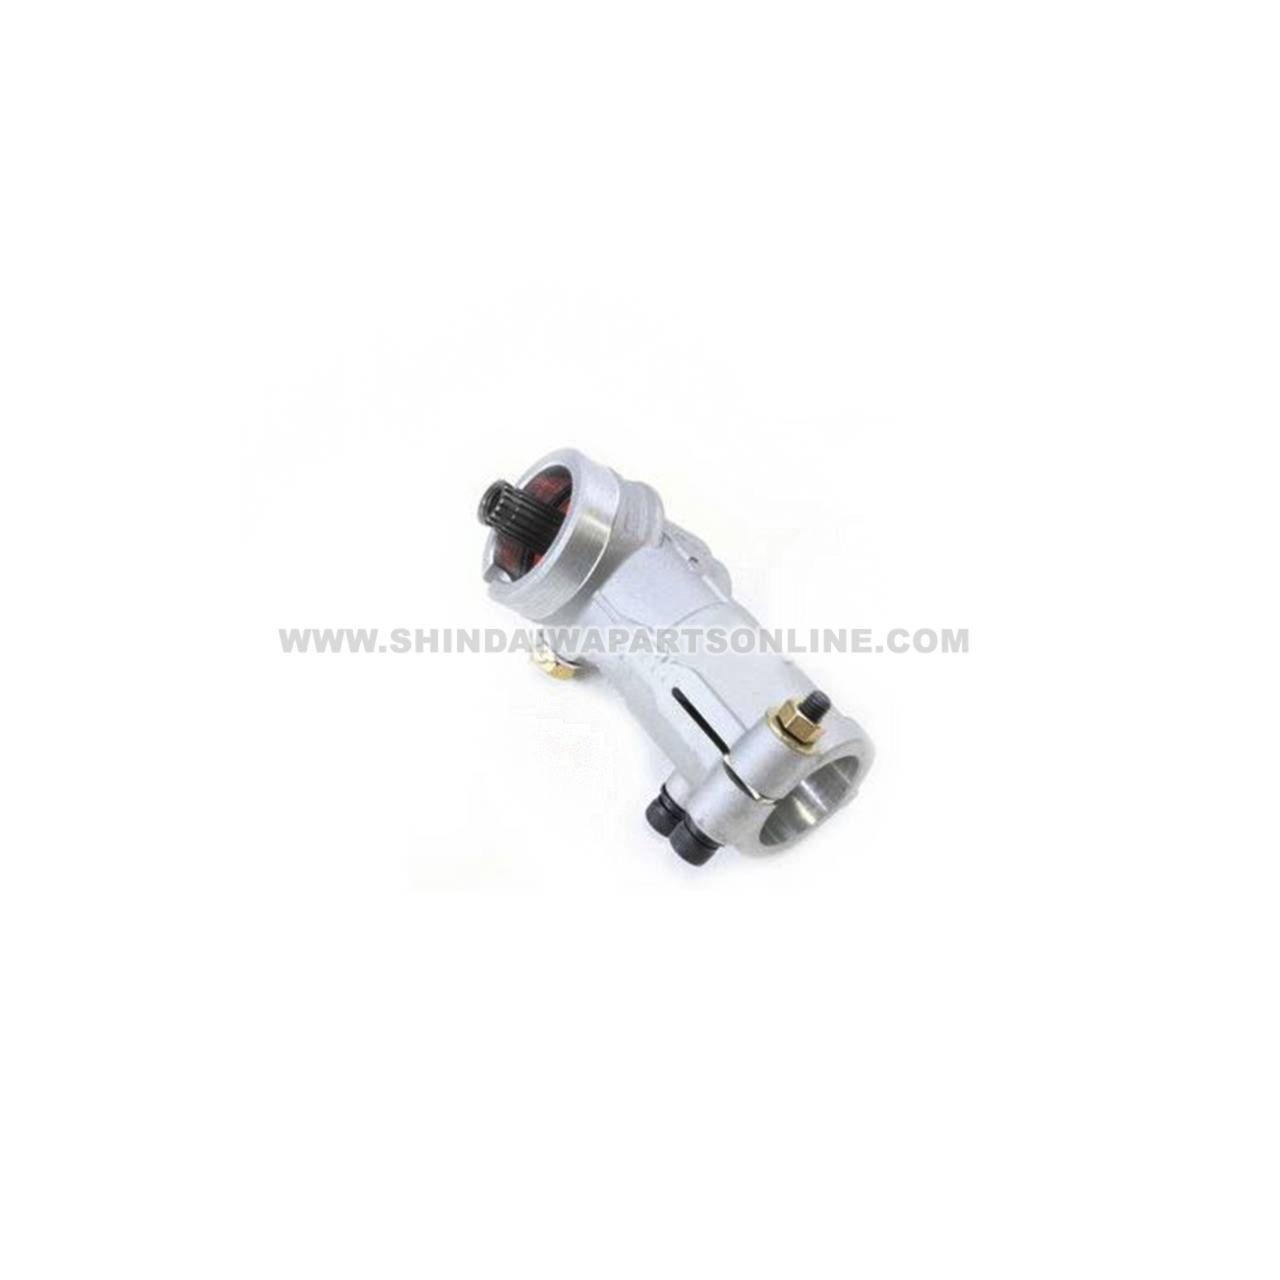 Genuine Shindaiwa Gear Case Assy P021029190 67007-63020  P021029192 T195S  22T